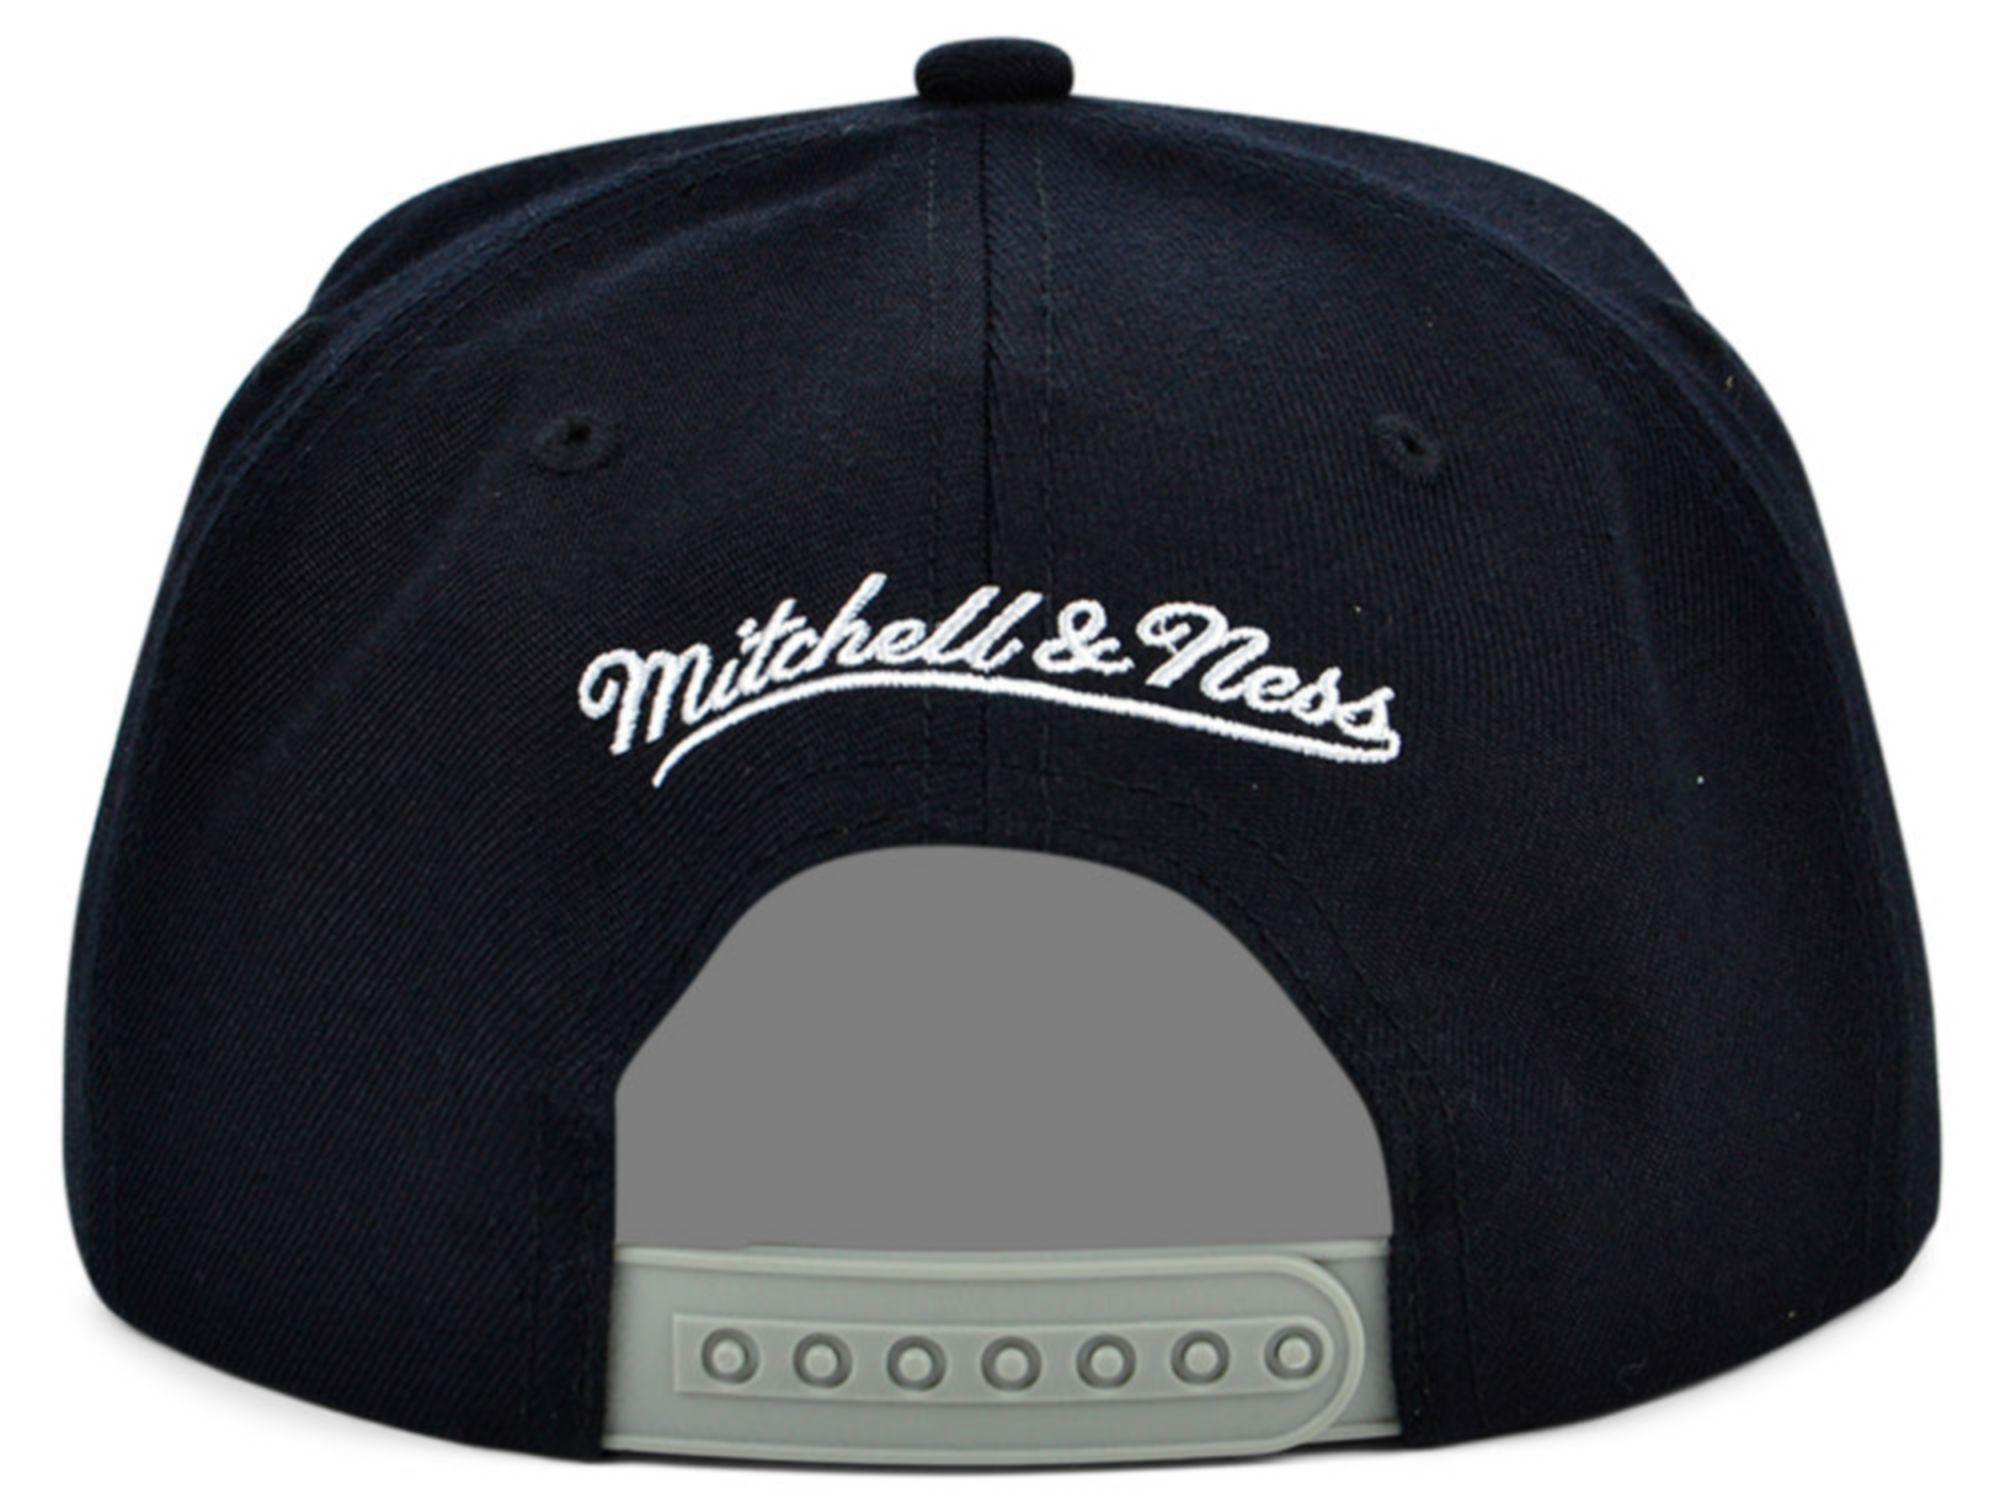 Mitchell & Ness Chicago Bulls 2 Tone Classic Snapback Cap & Reviews - Sports Fan Shop By Lids - Men - Macy's